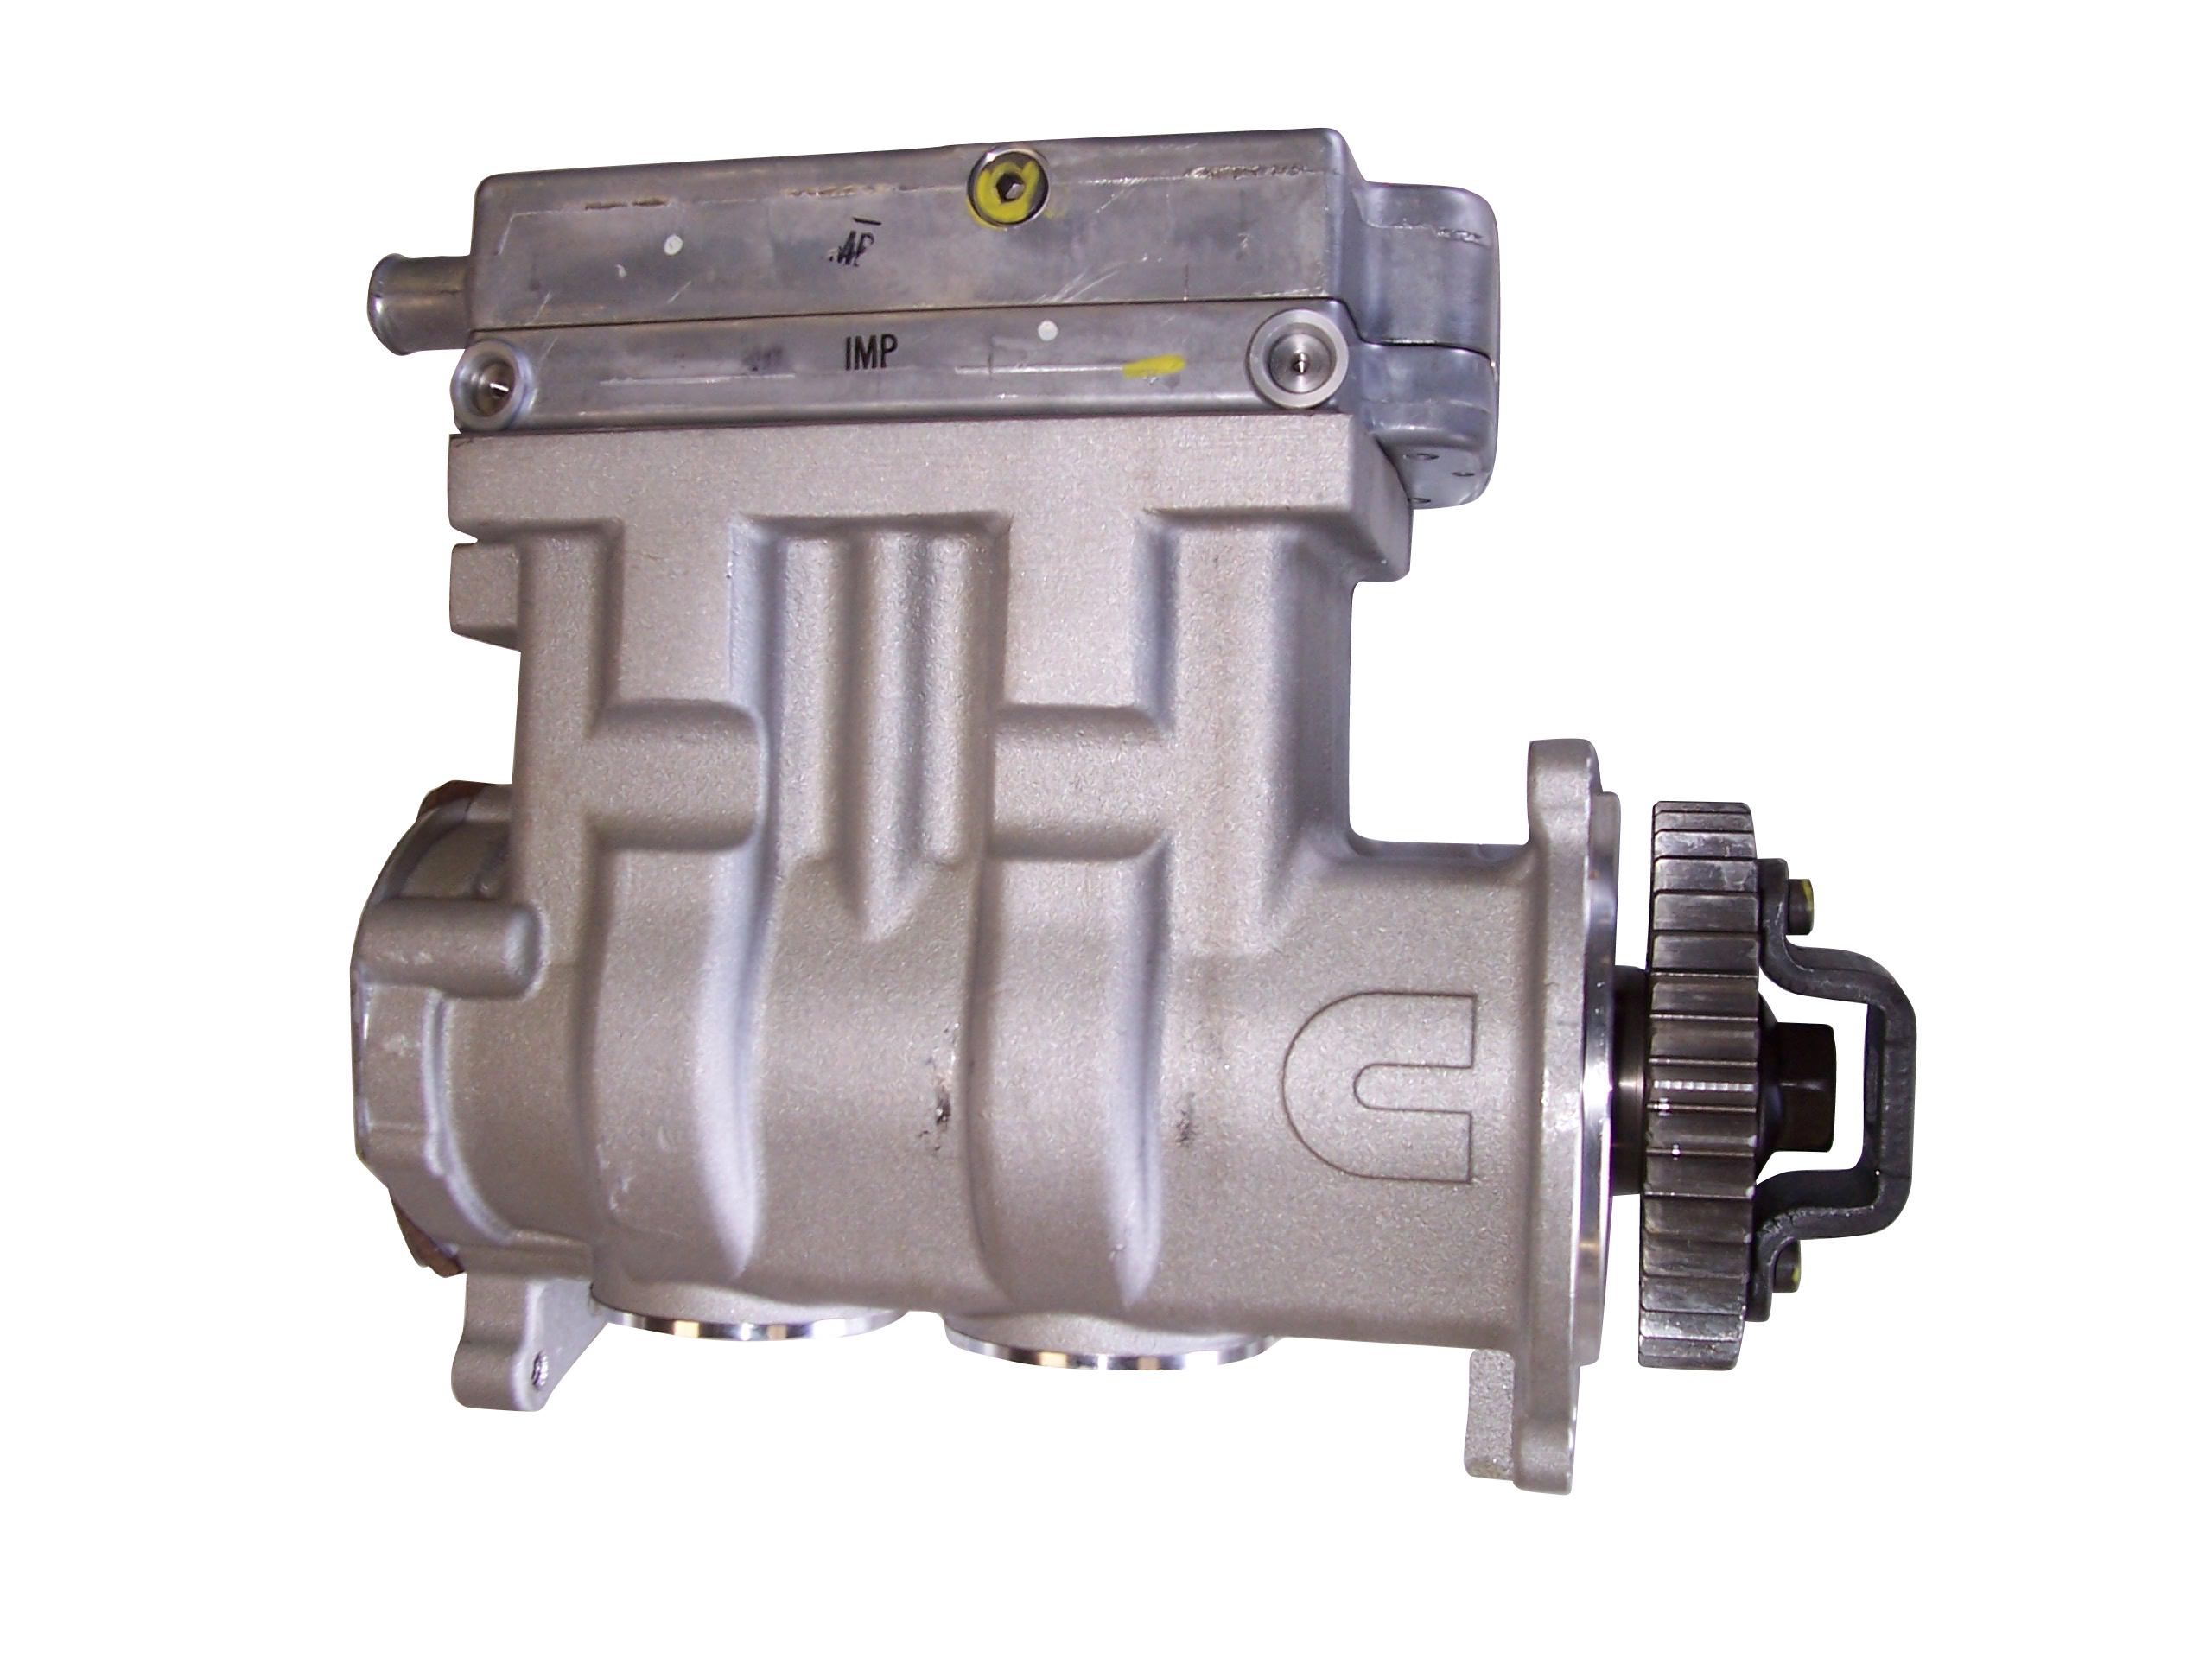 File:Truck air compressor.jpg - Wikimedia Commons